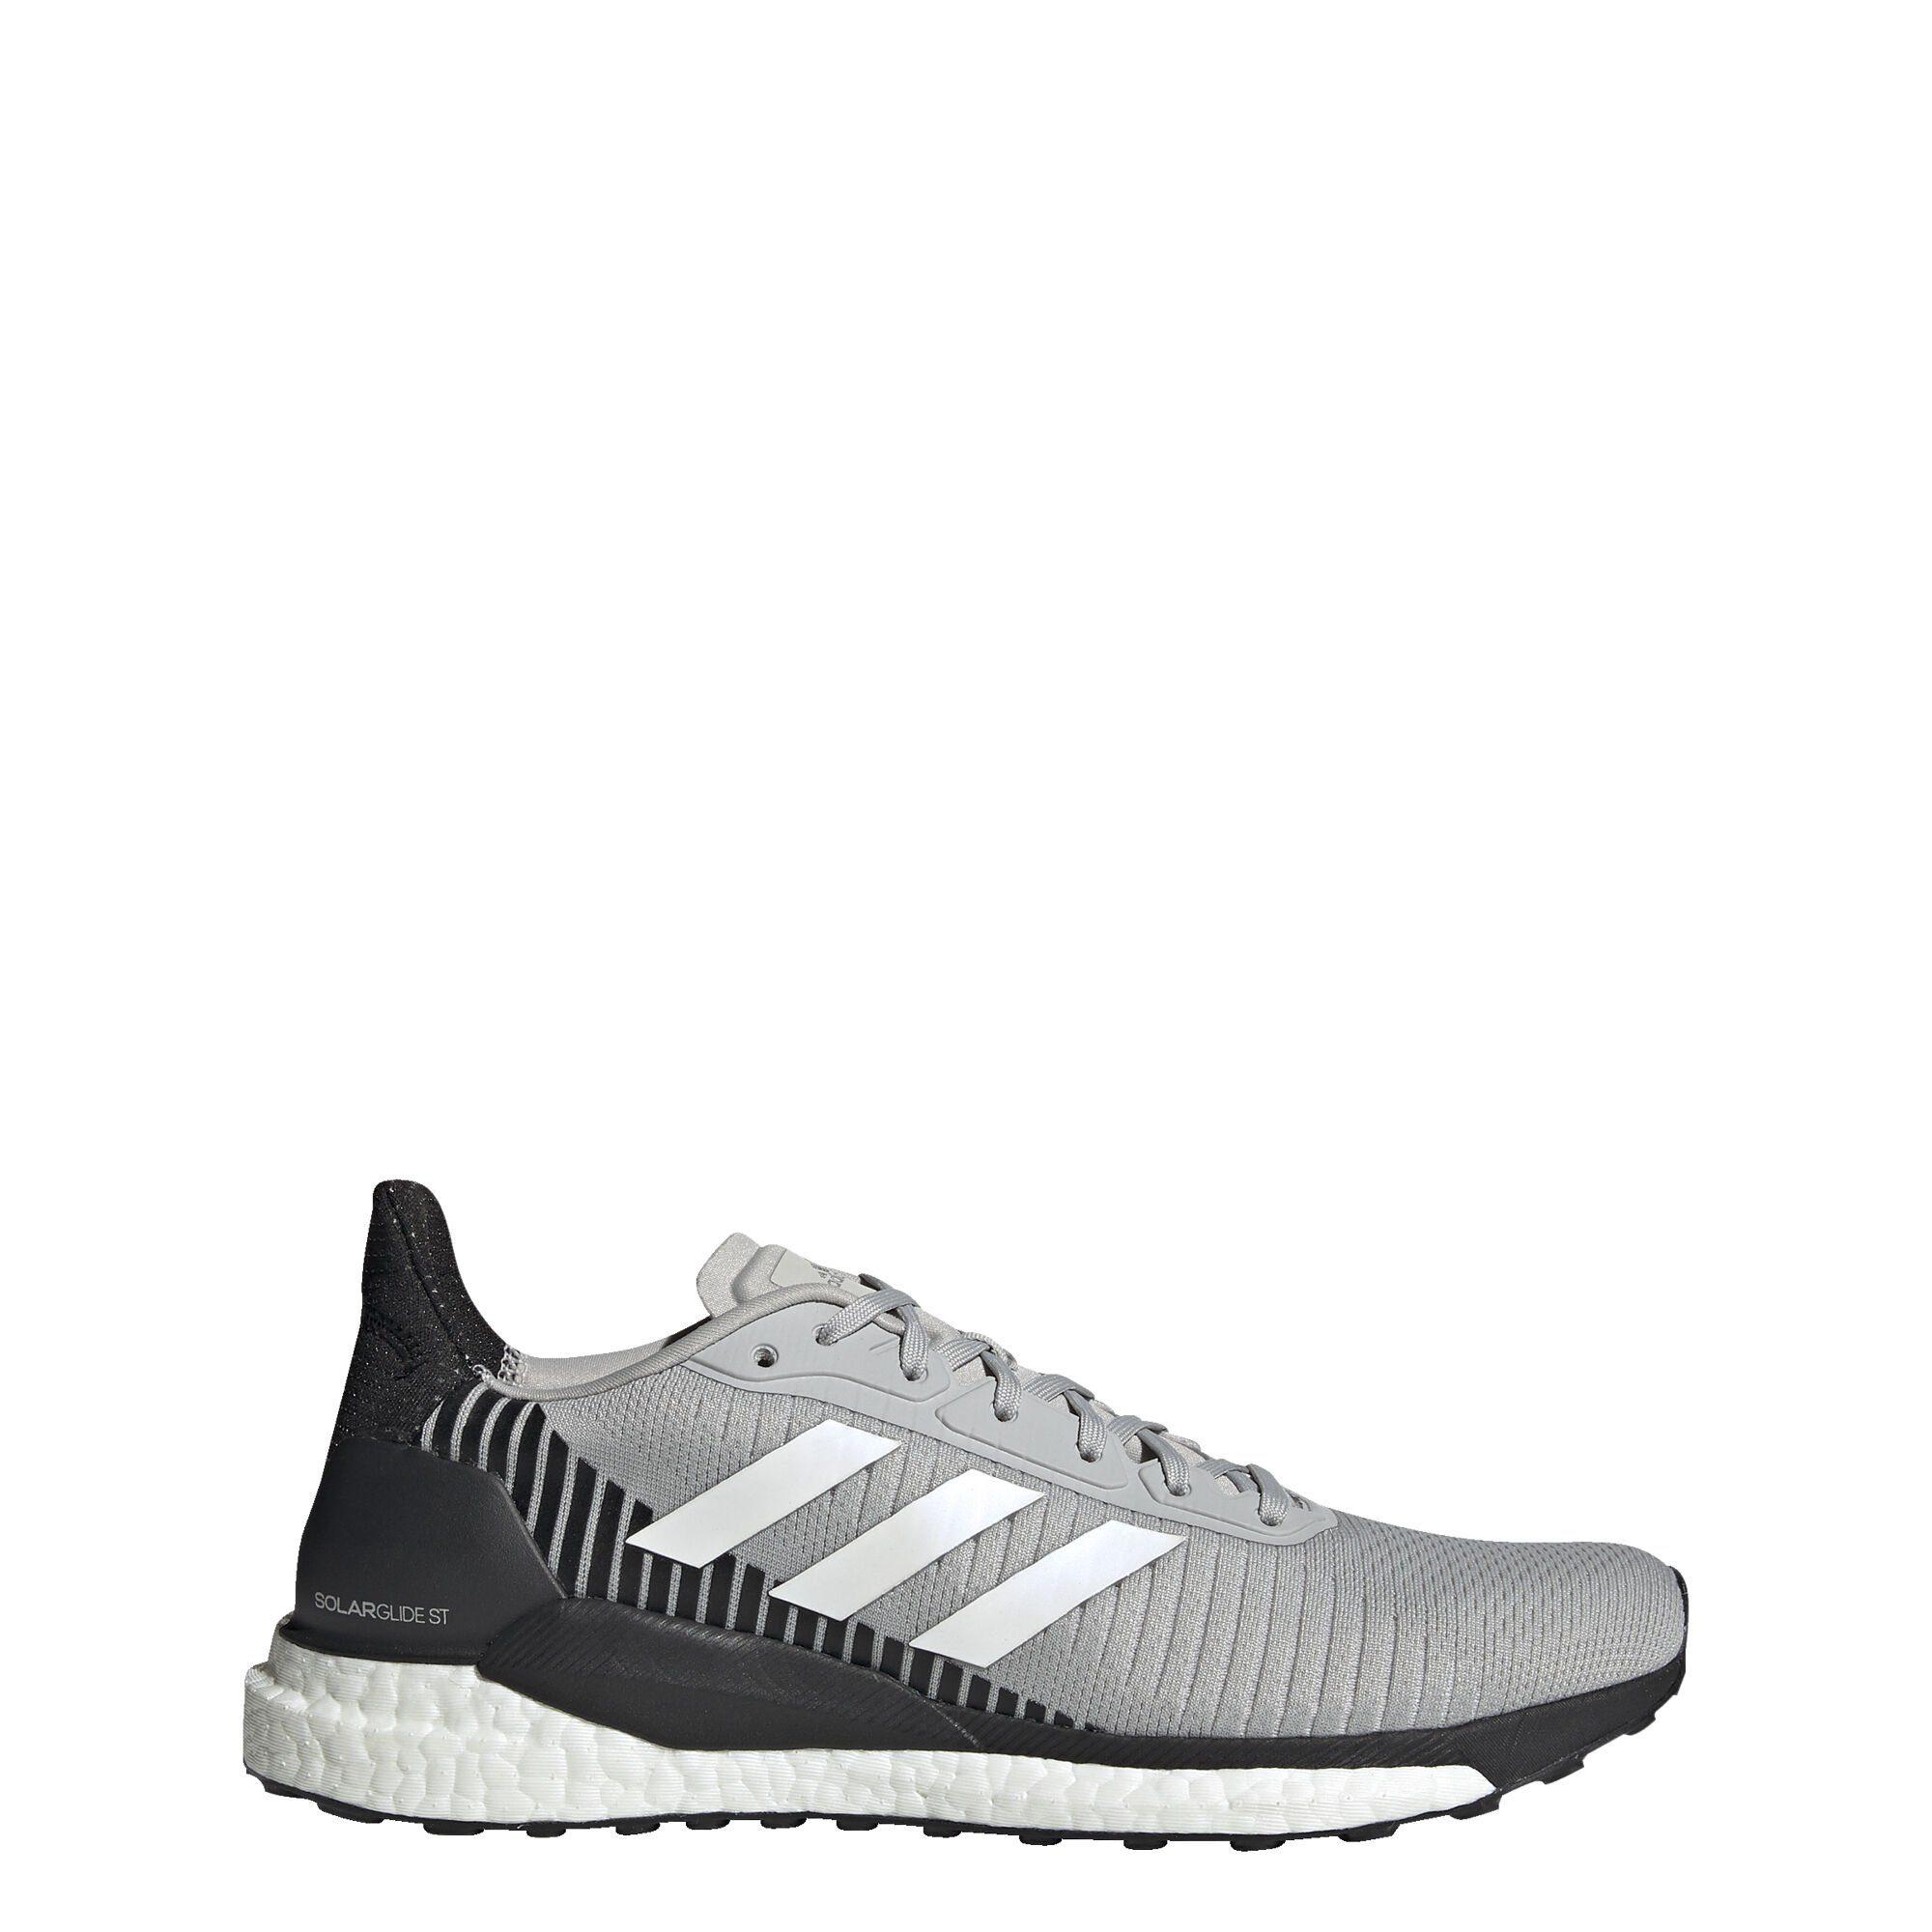 KaufenOtto Schuh« Online St Laufschuh Performance »solarglide Adidas 19 4R3L5Ajq